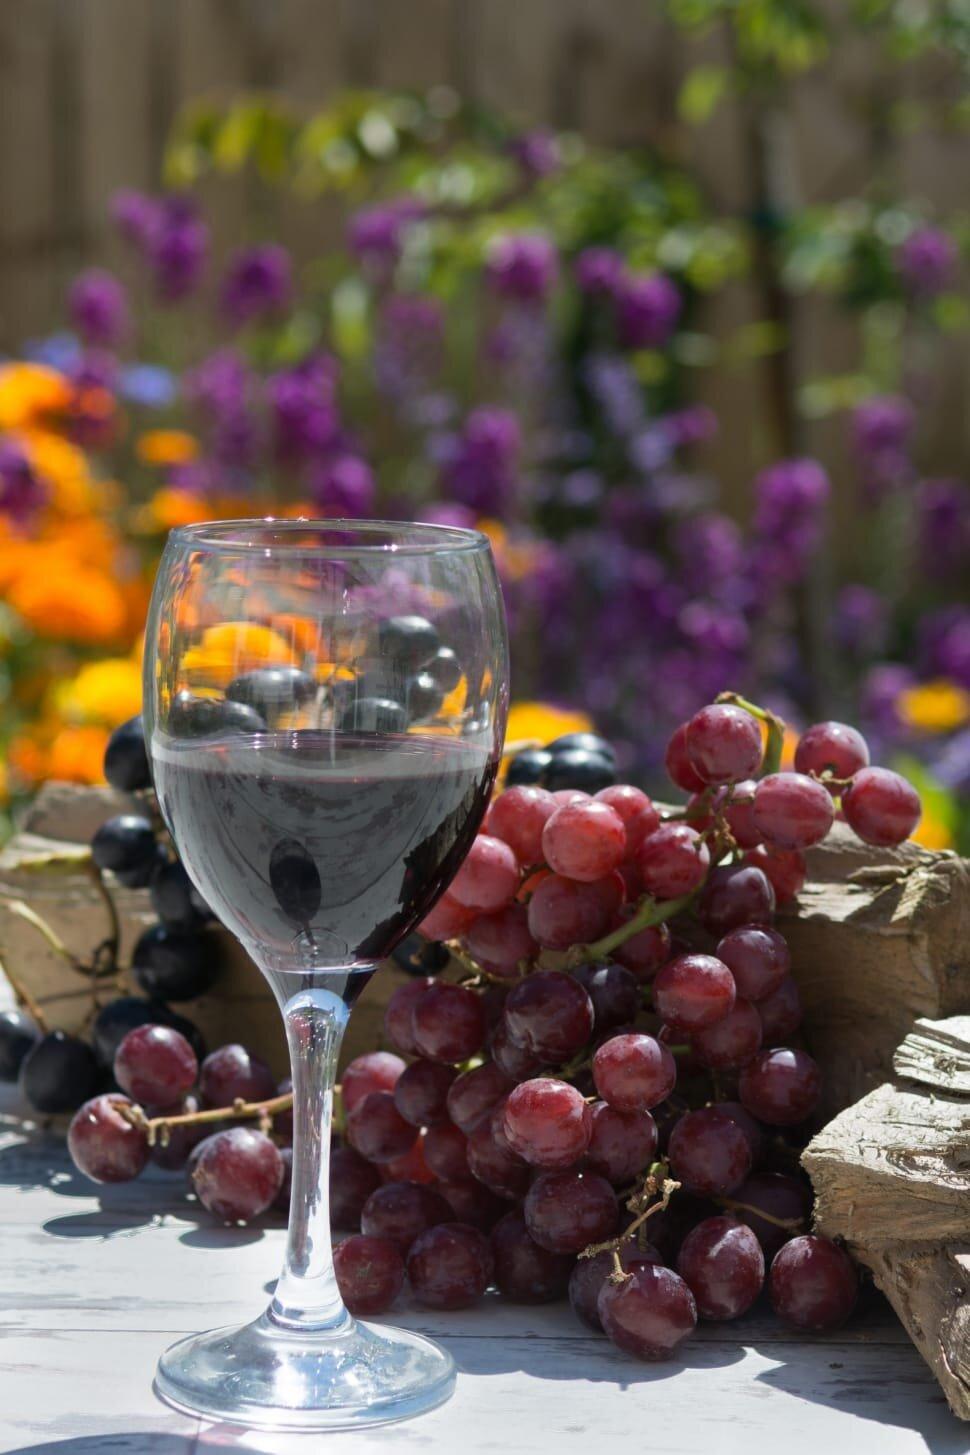 clear-wine-glass-near-grape-fruit-wallpaper-preview.jpg